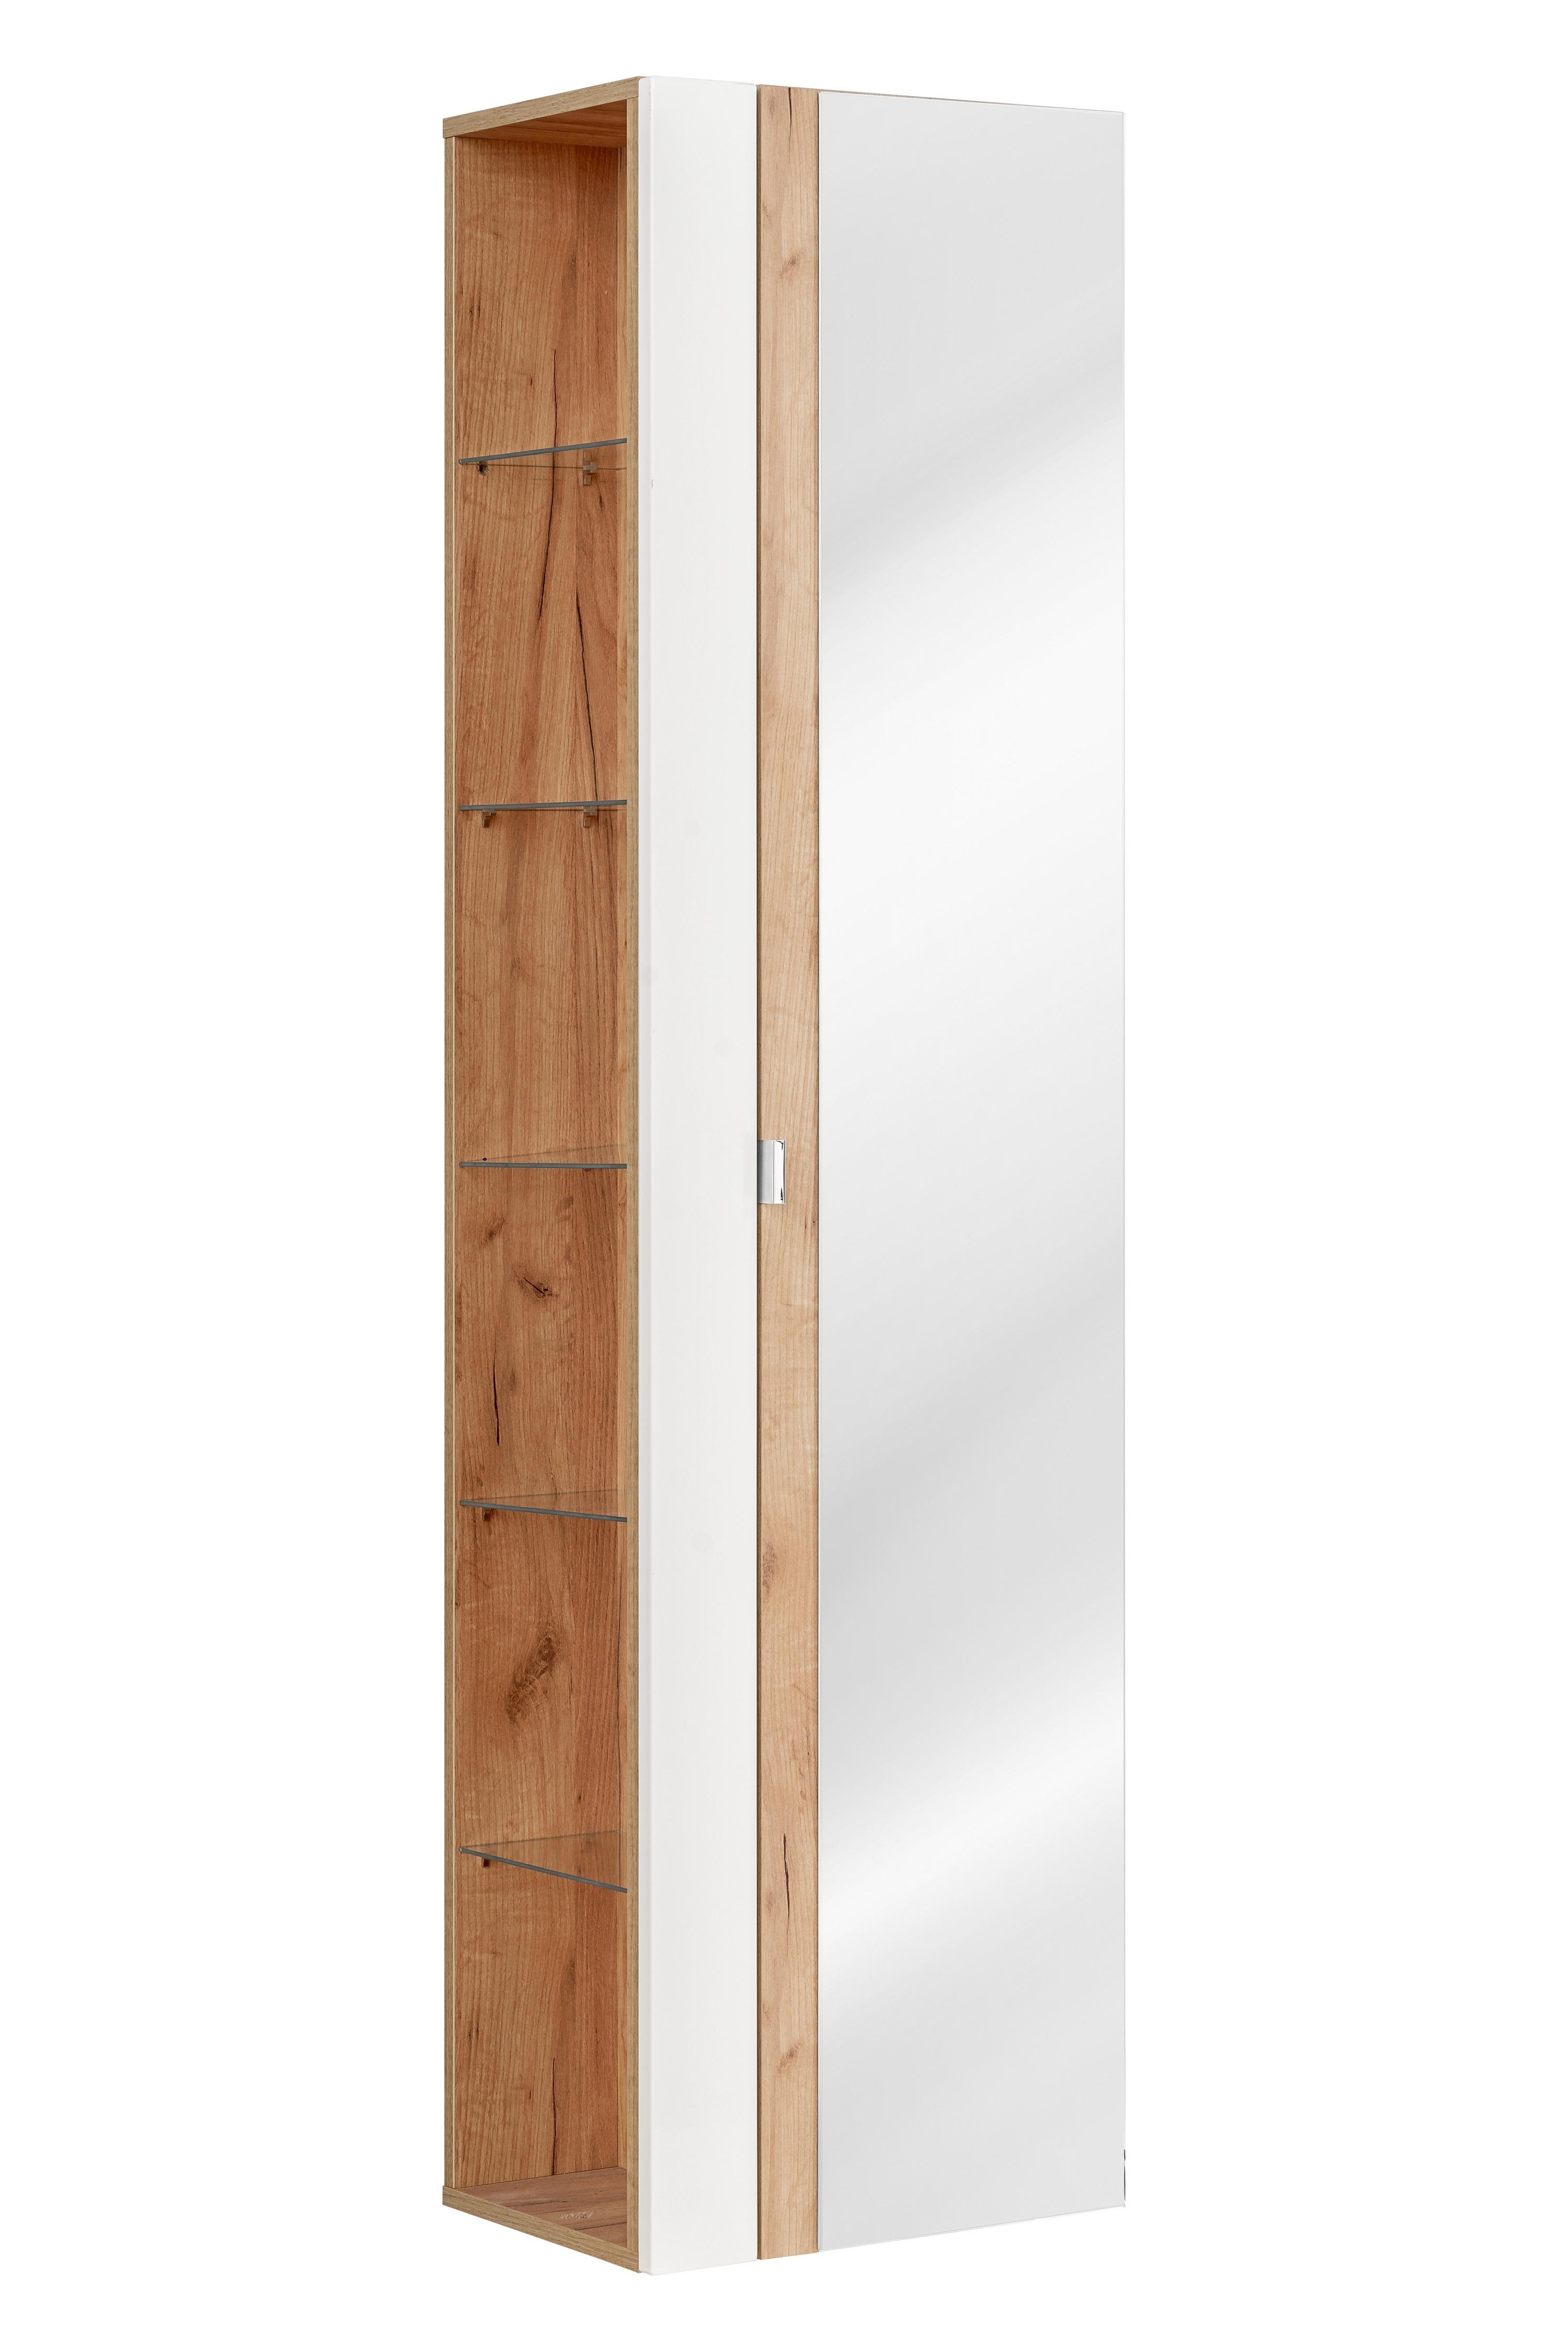 Dulap baie inalt cu 1 usa si oglinda, Capri White, l45xA33xH170 cm imagine